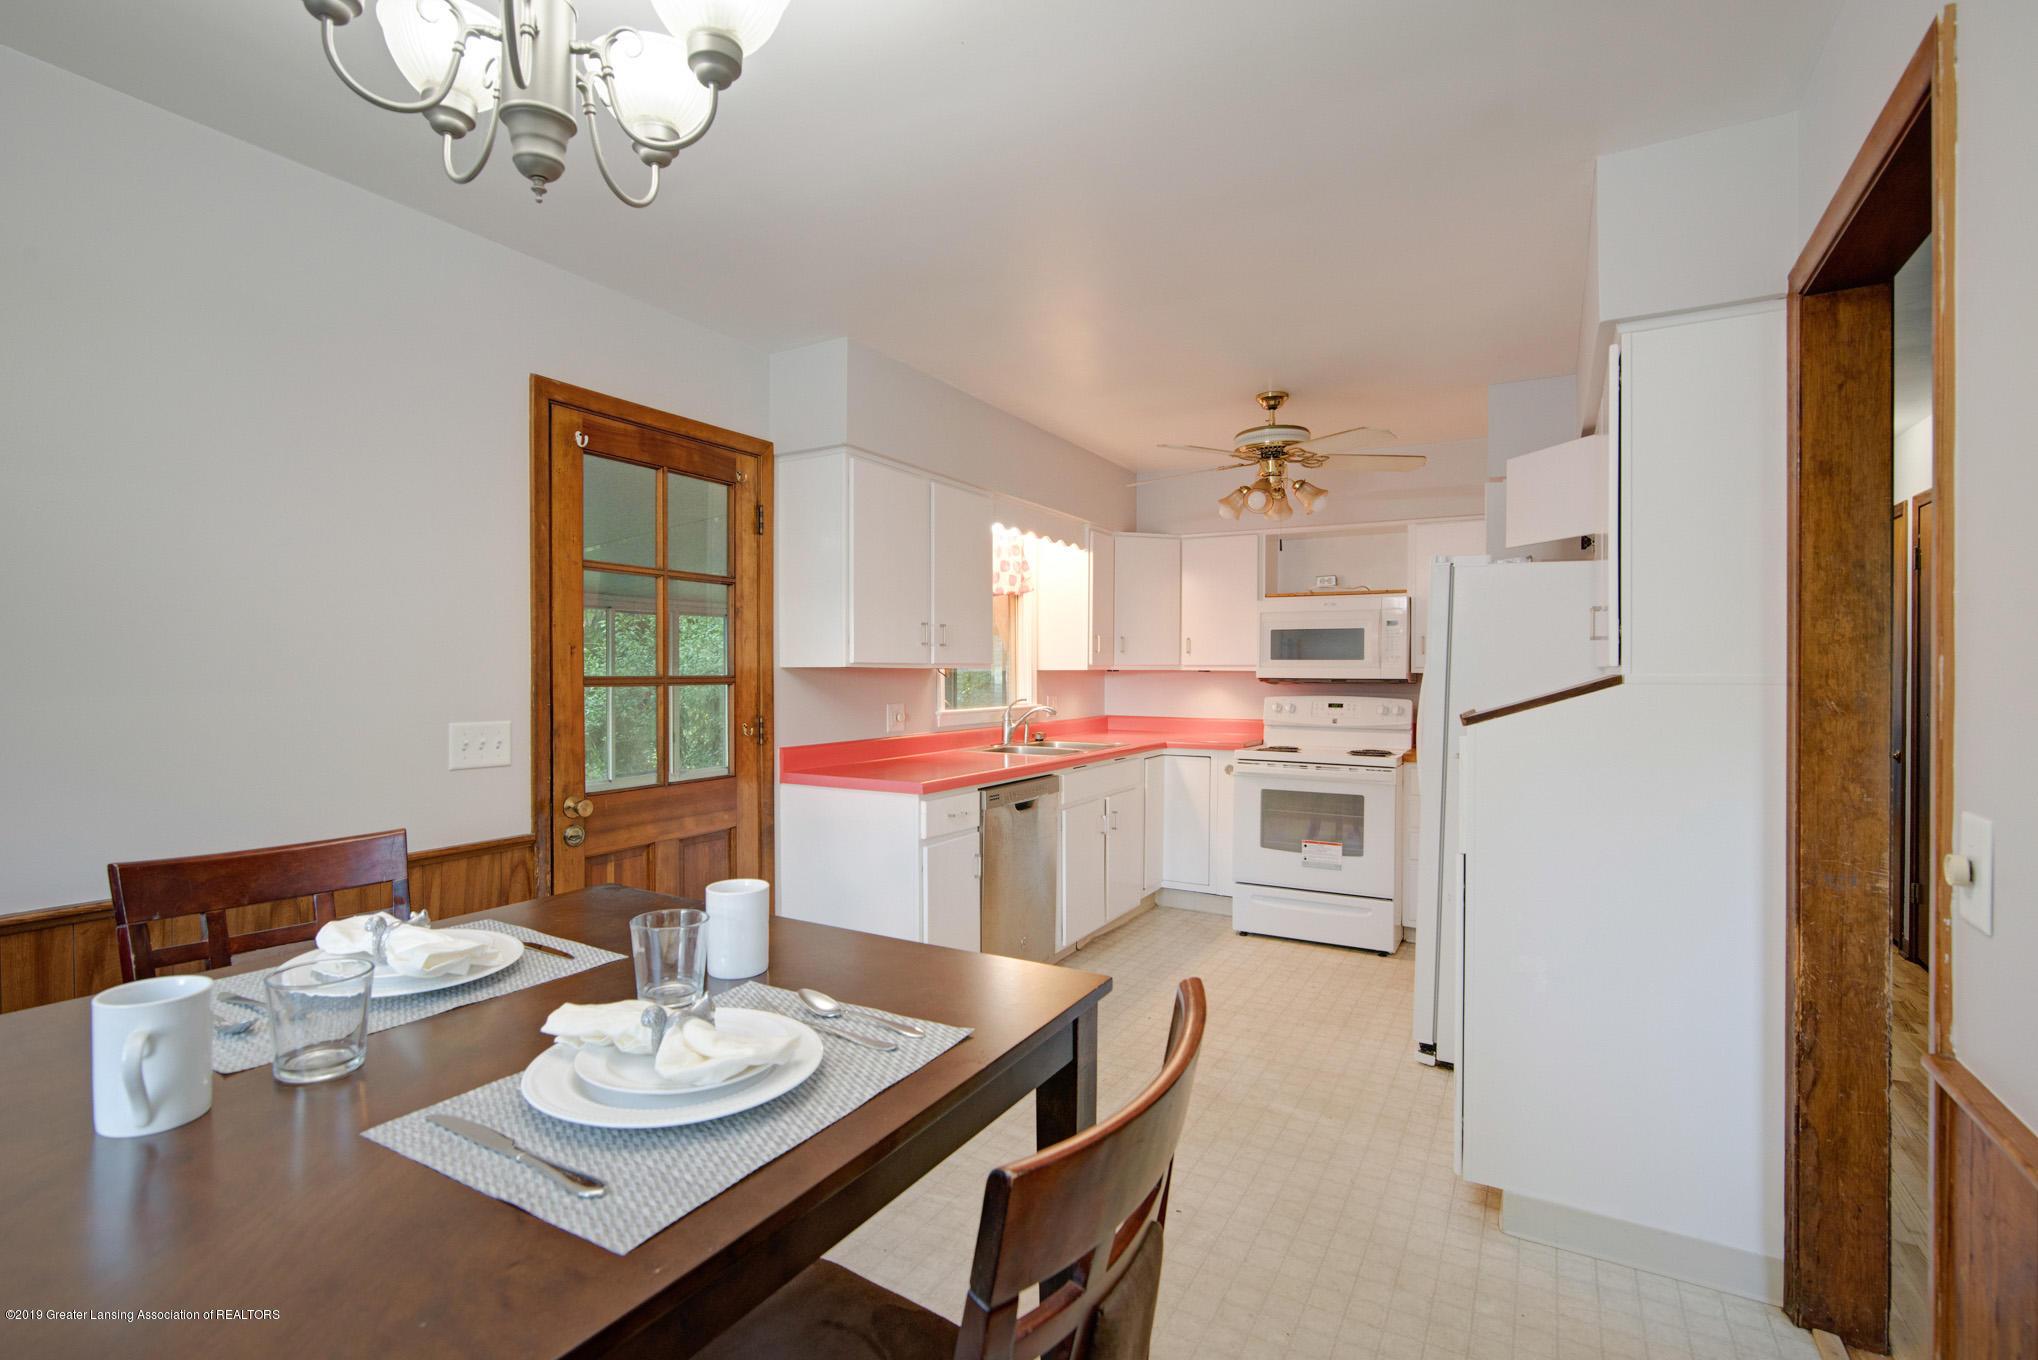 1237 Daisy Ln - Dining/Kitchen - 8